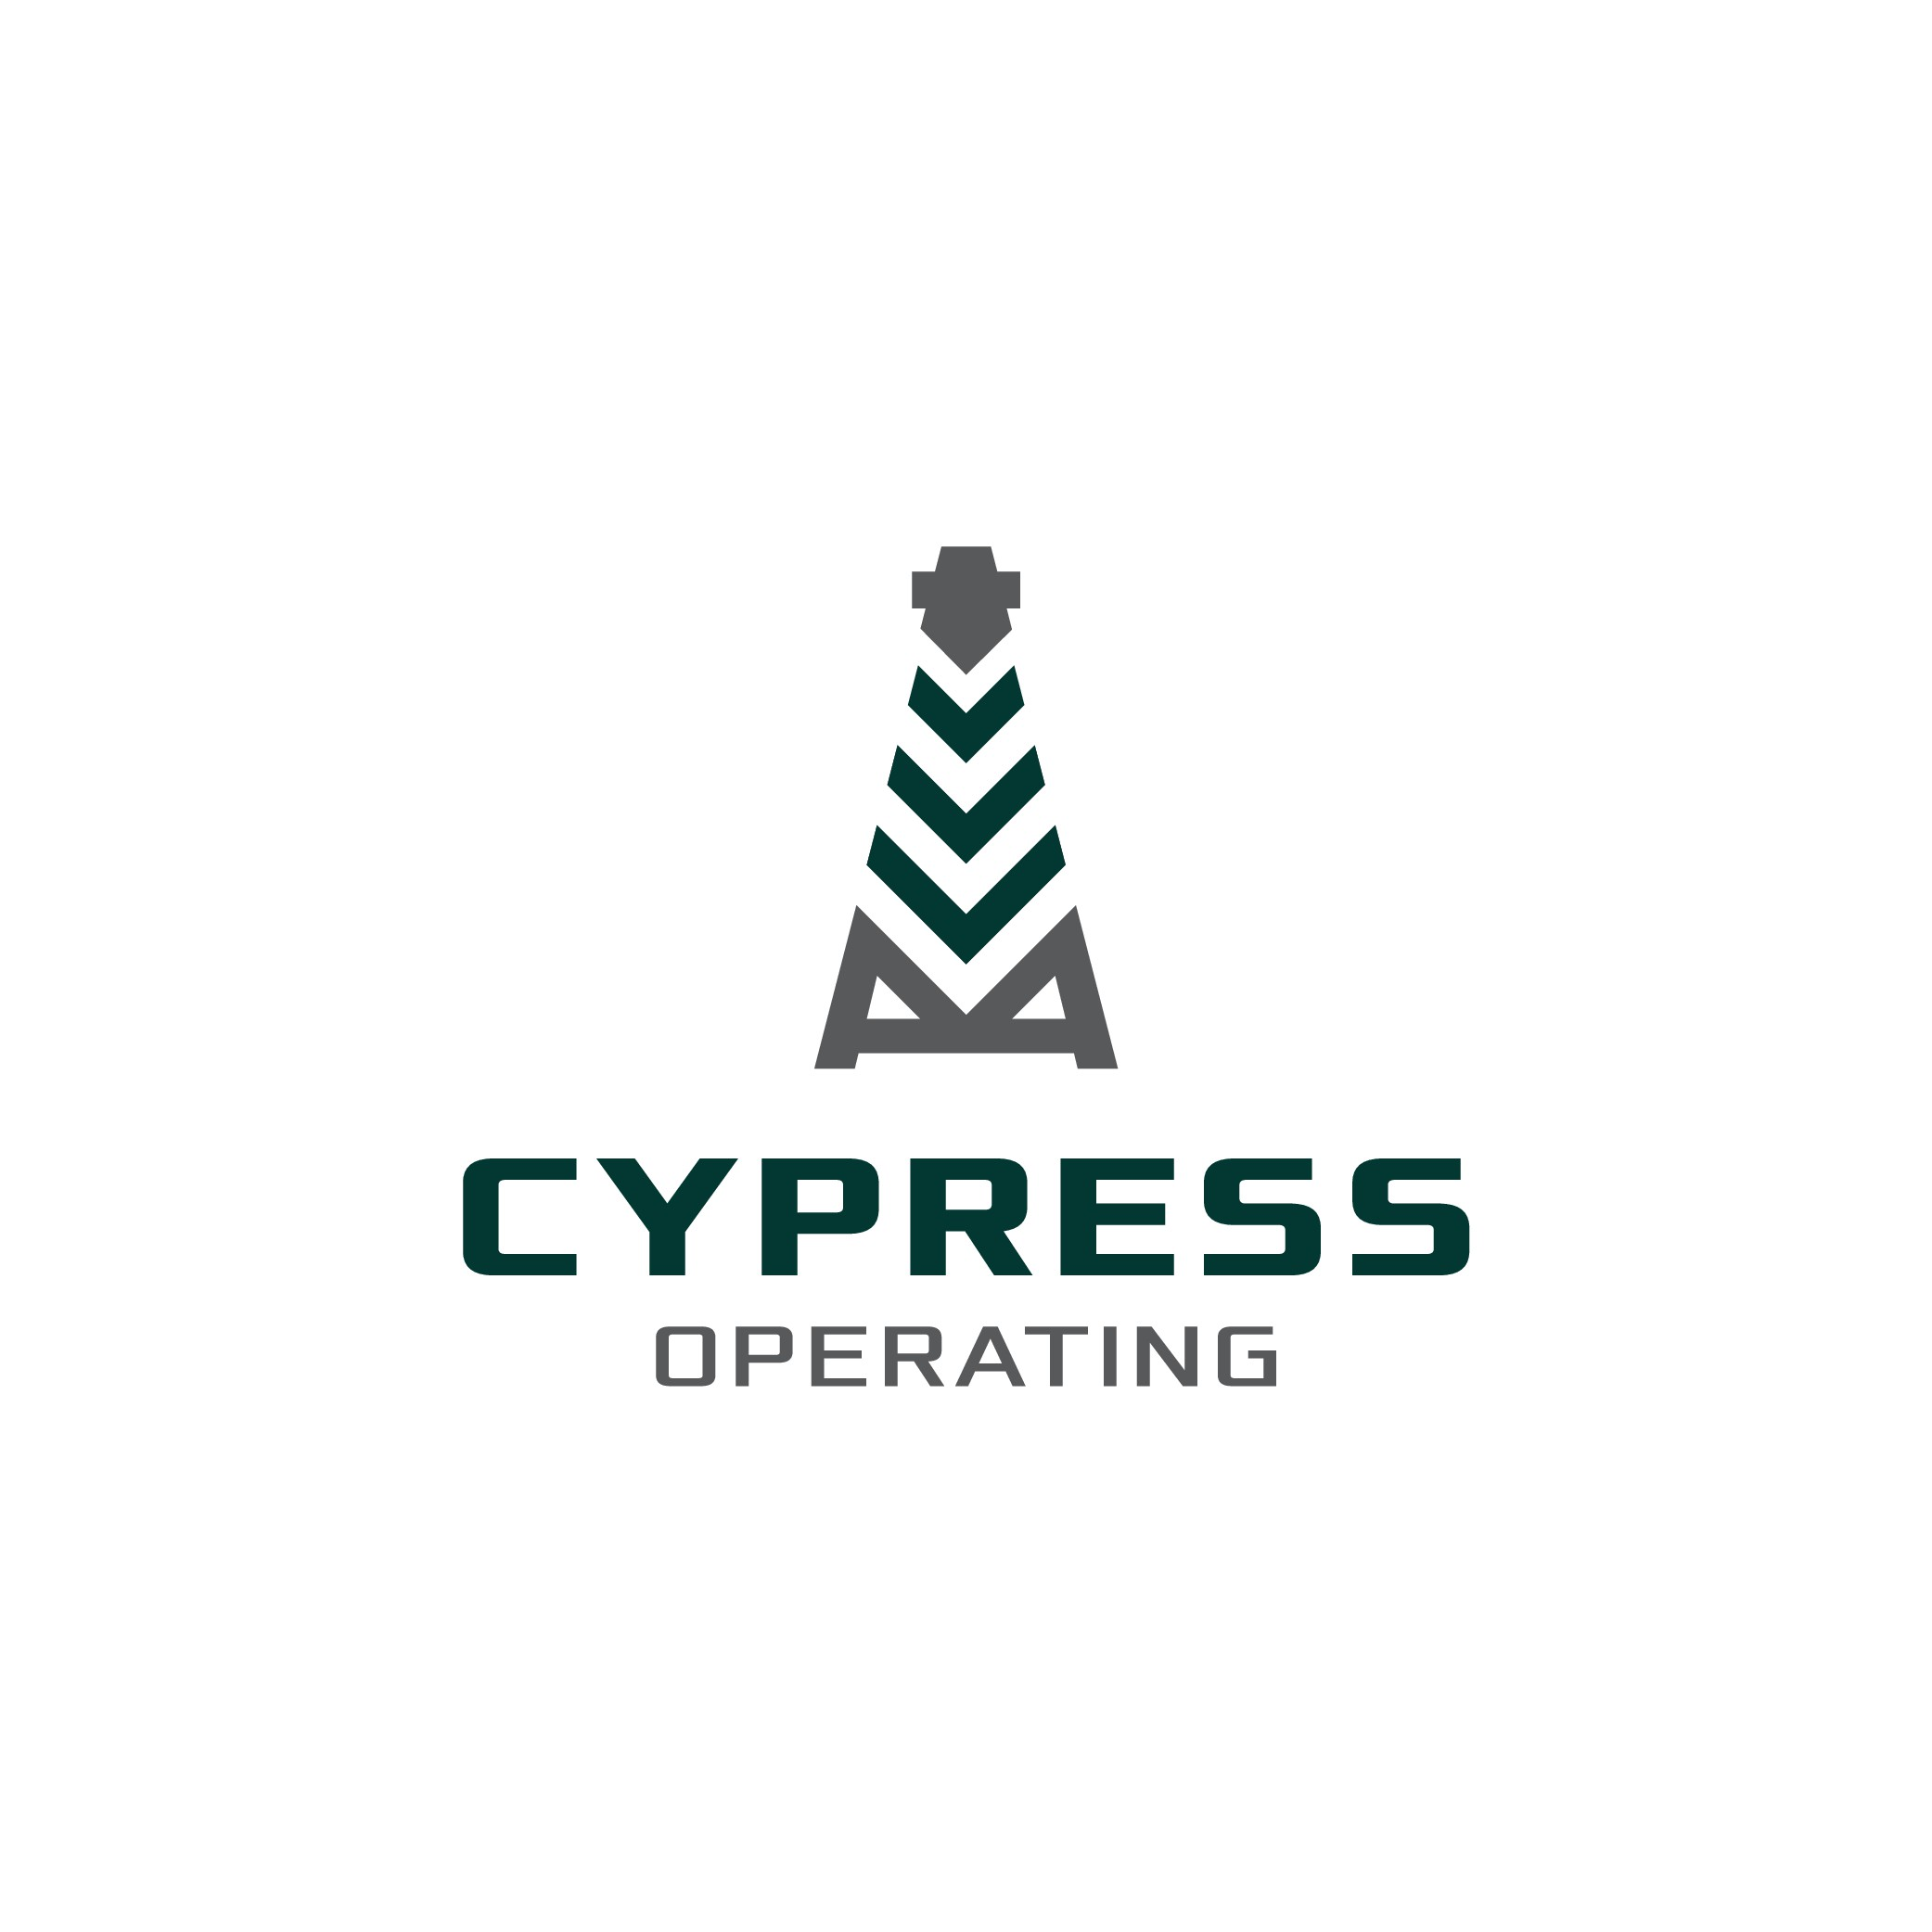 Engineering firm needs an updated logo